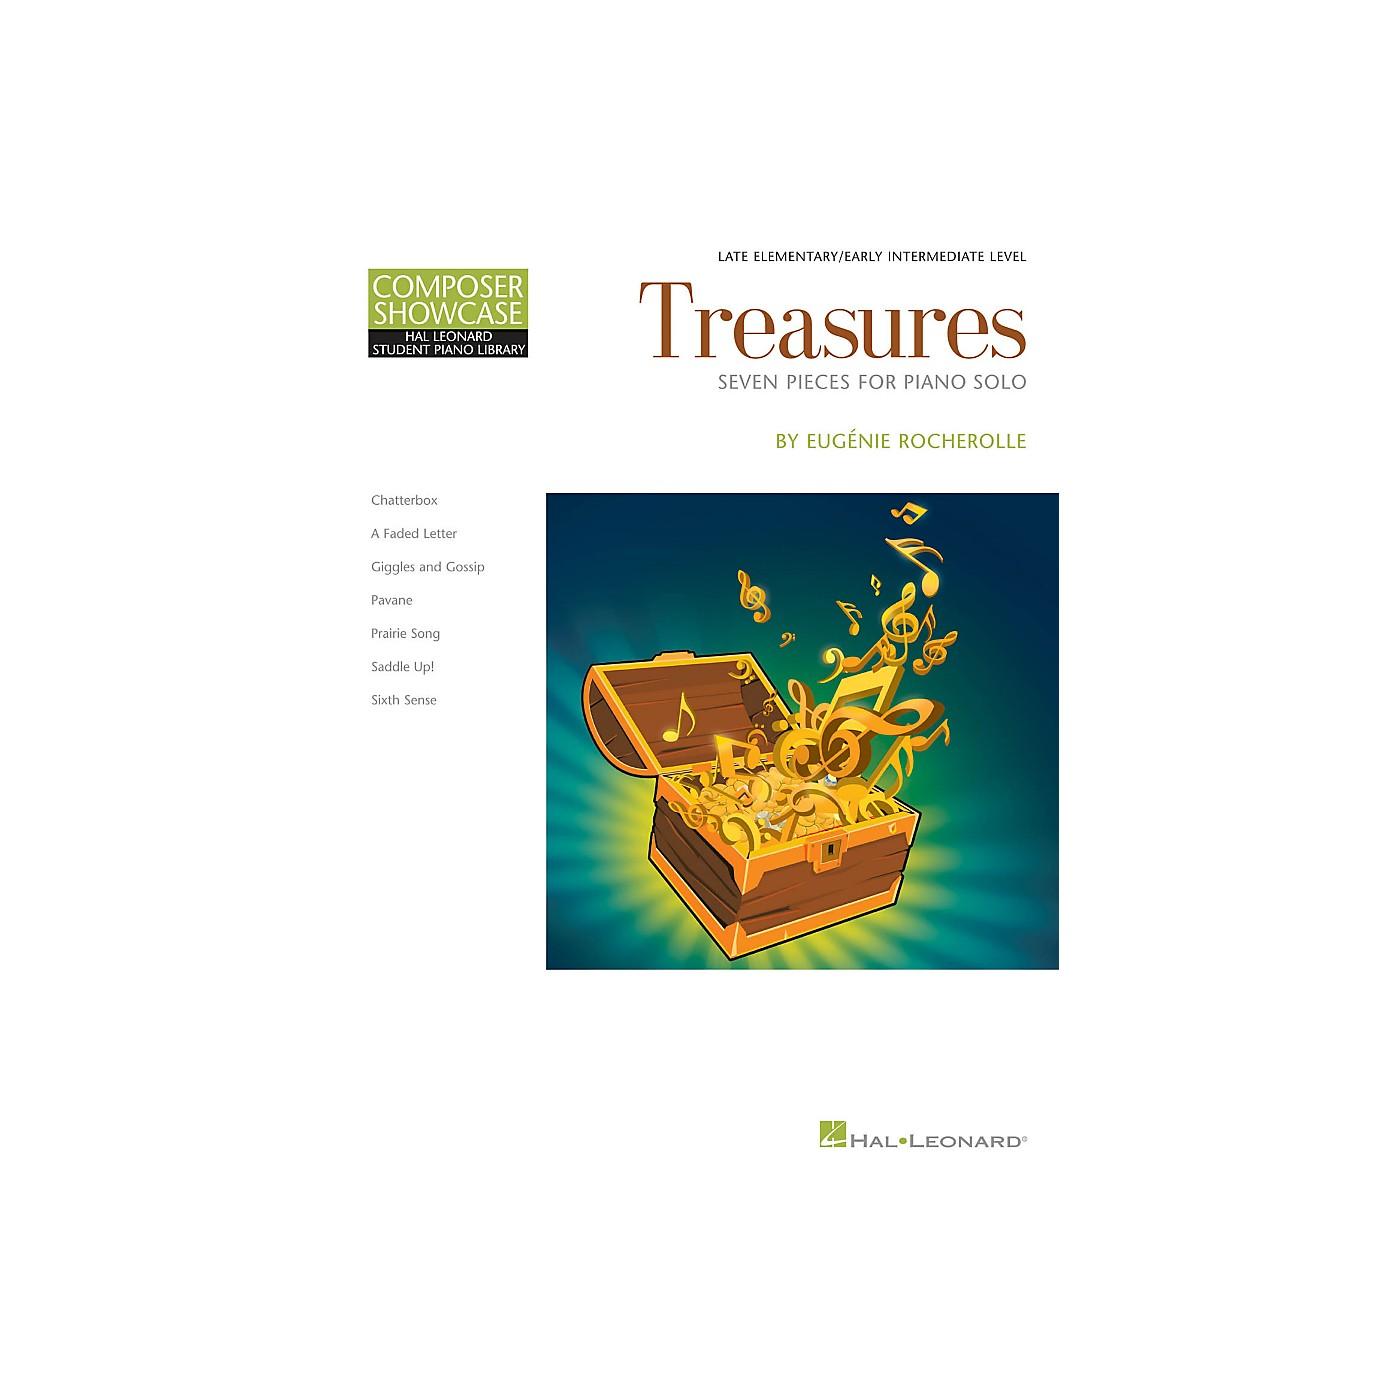 Hal Leonard Treasures by Eugenie Rocherolle - Hal Leonard Composer Showcase Late Elementary Piano Solo thumbnail